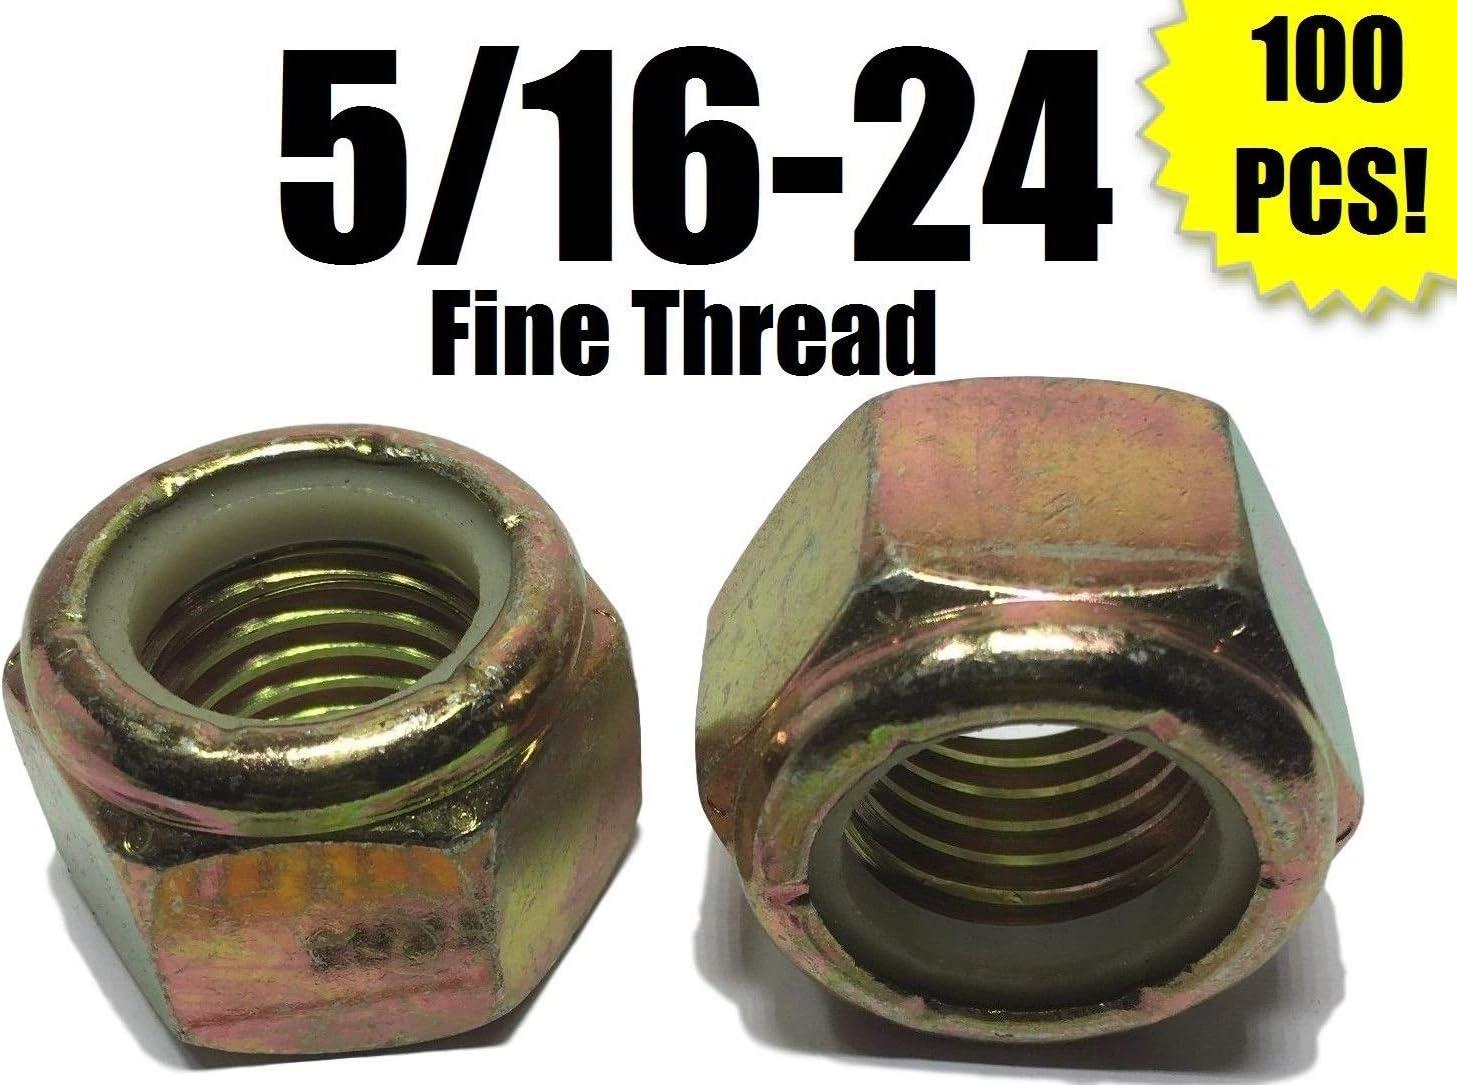 PCs 100 5//16-24 Fine Grade 8 Nylon Insert Lock Replacement Threaded Nuts Assortment Set Nylock Yellow Zinc Plated